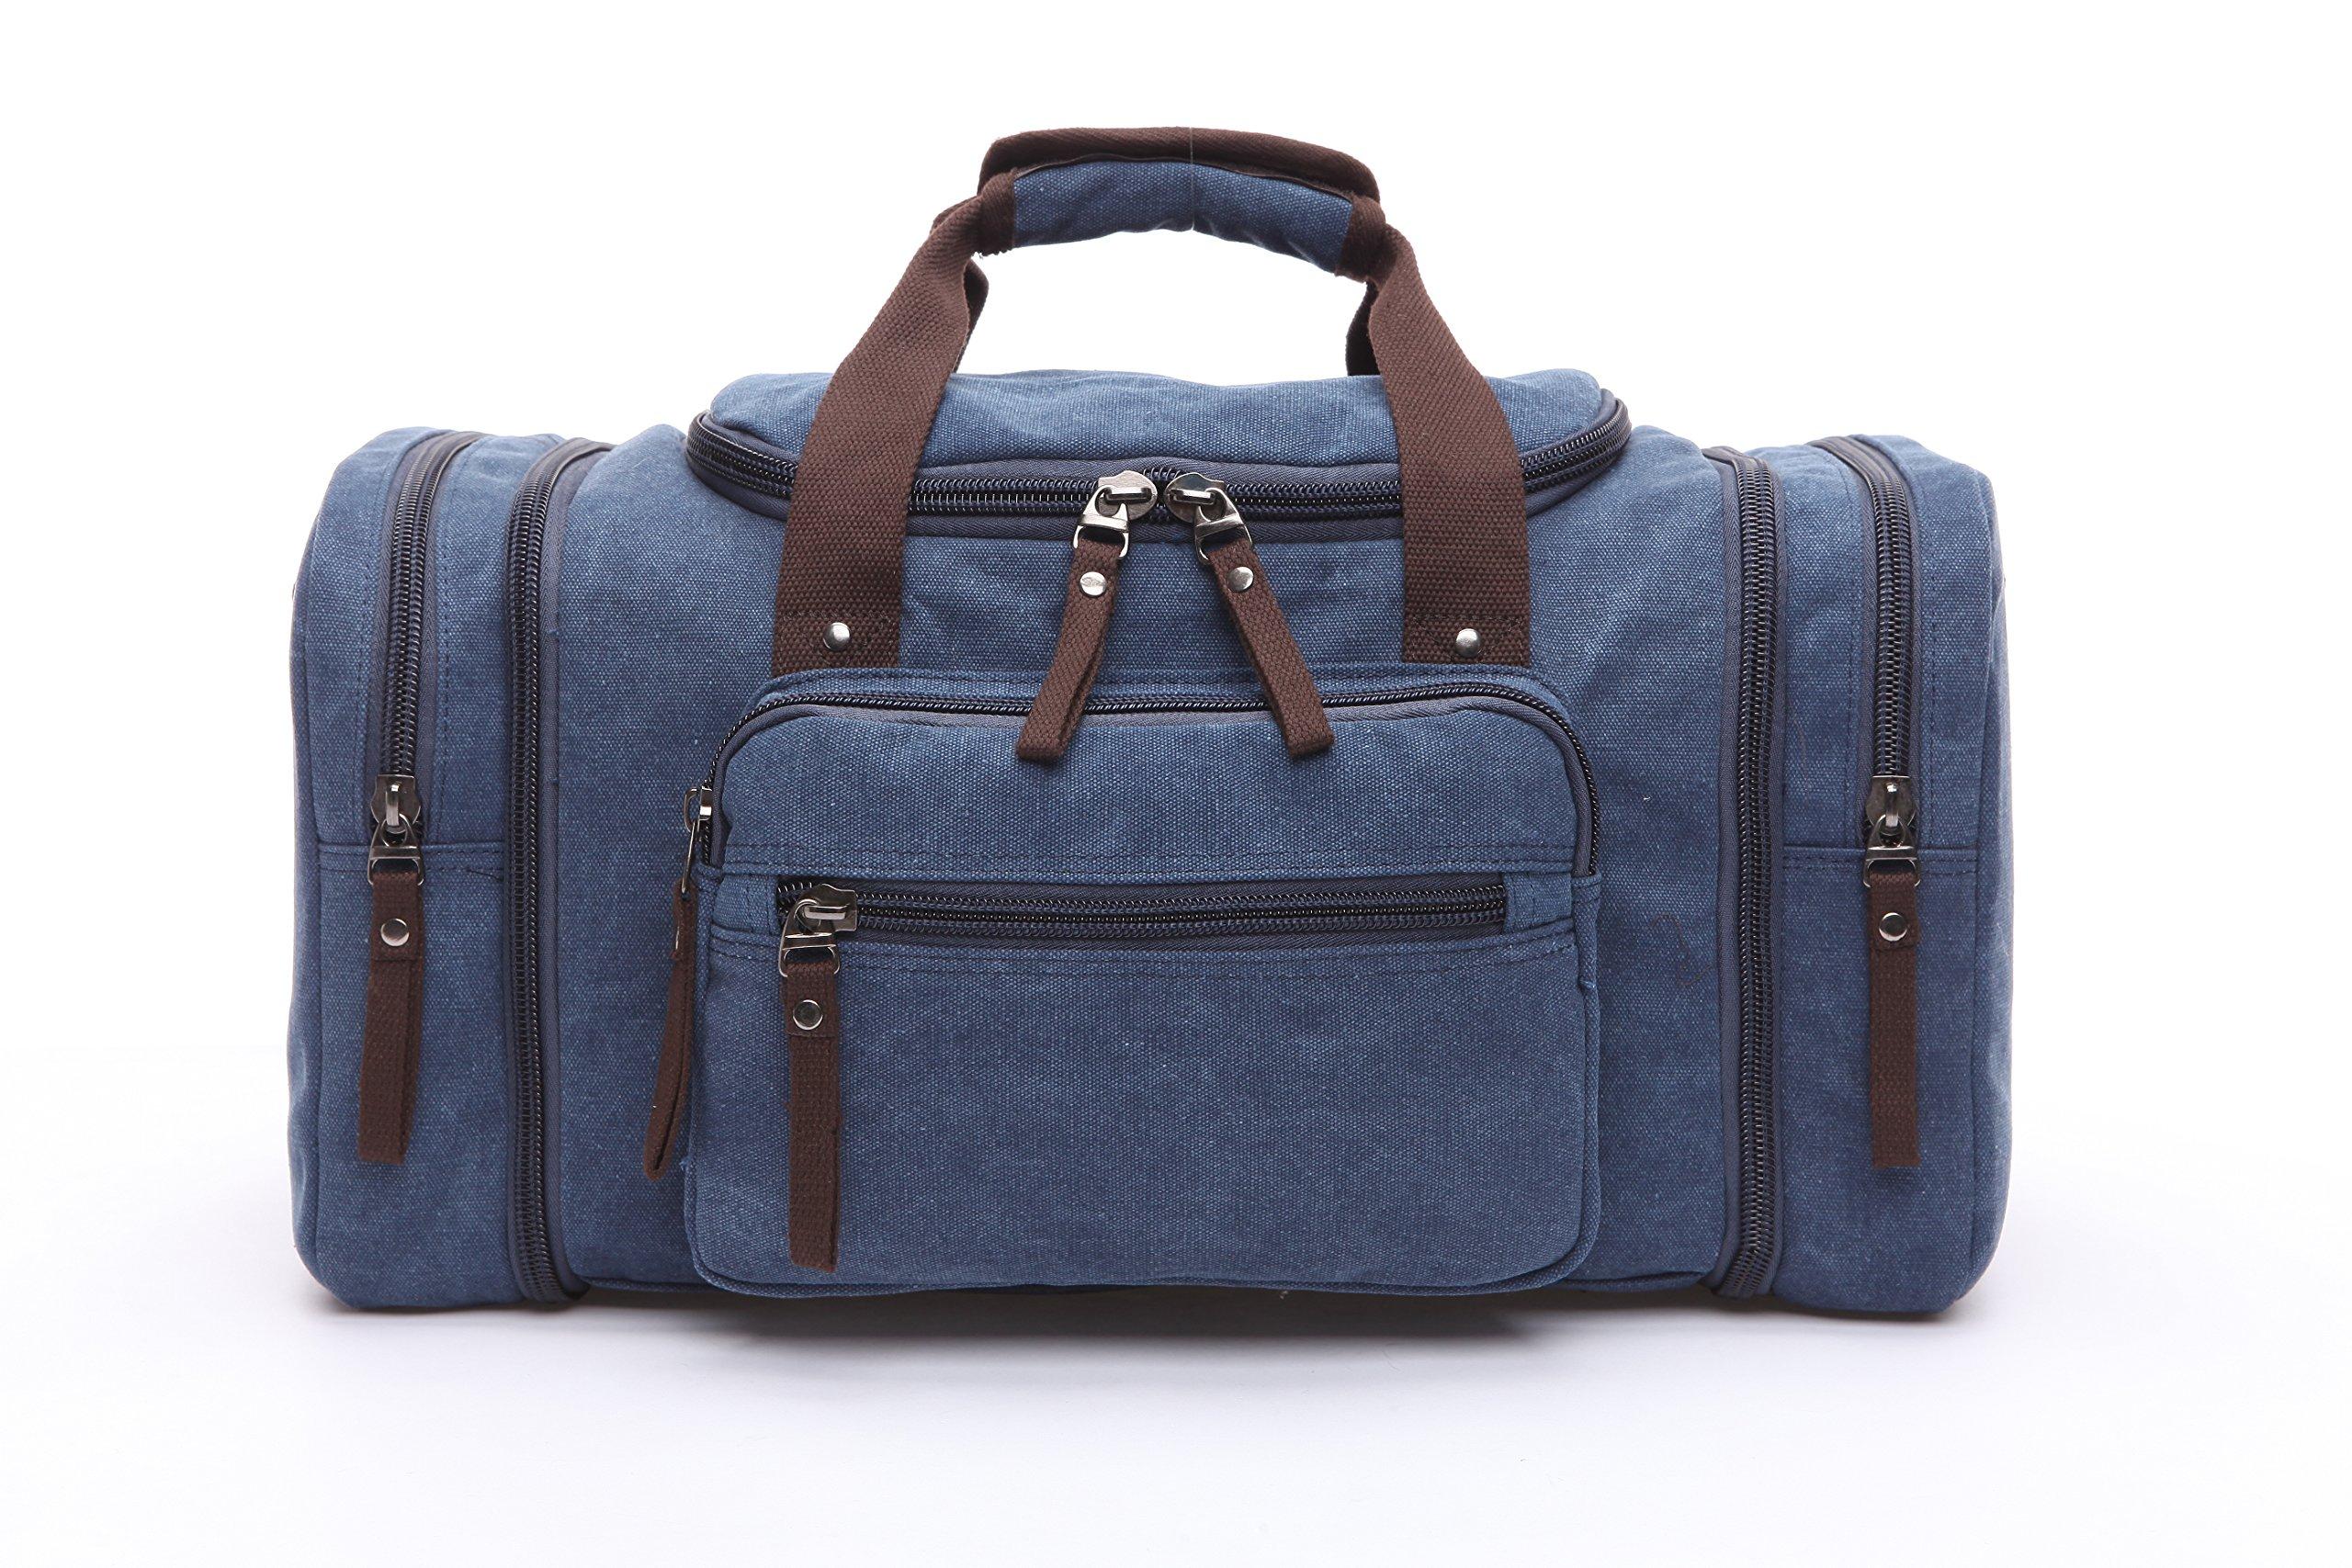 FengJu Vintage Large Canvas Travel Duffel Bag SportsDuffels Oversized blue